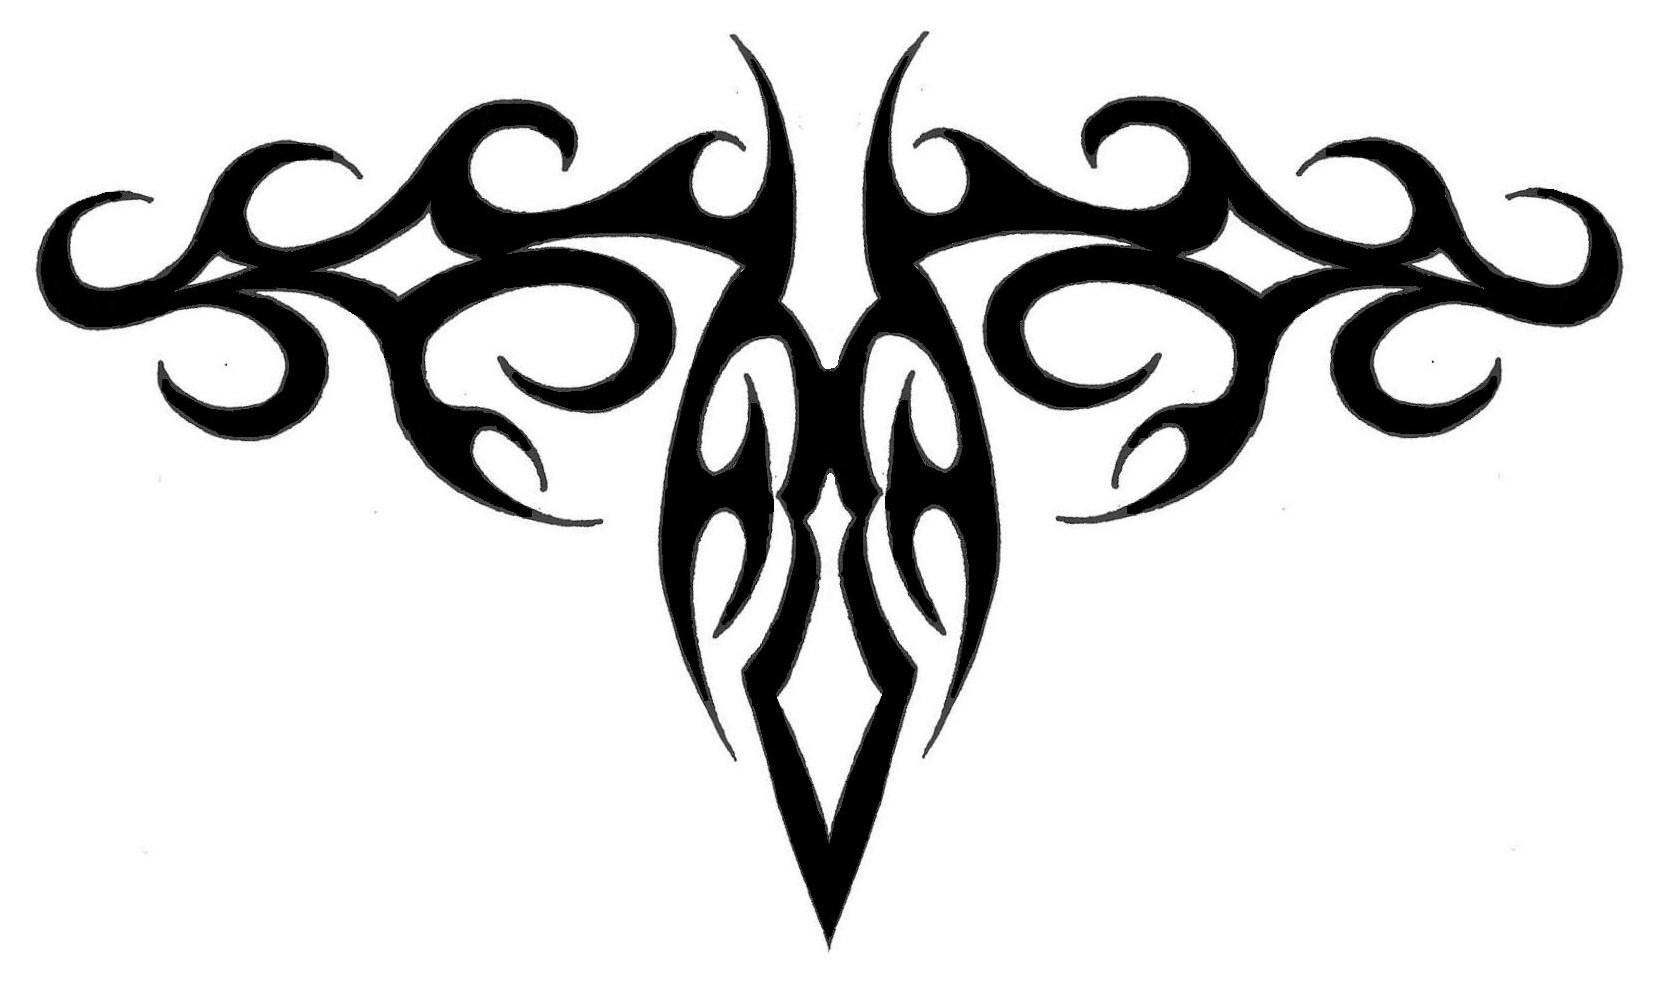 Free Free Tattoo Pic, Download Free Clip Art, Free Clip Art.